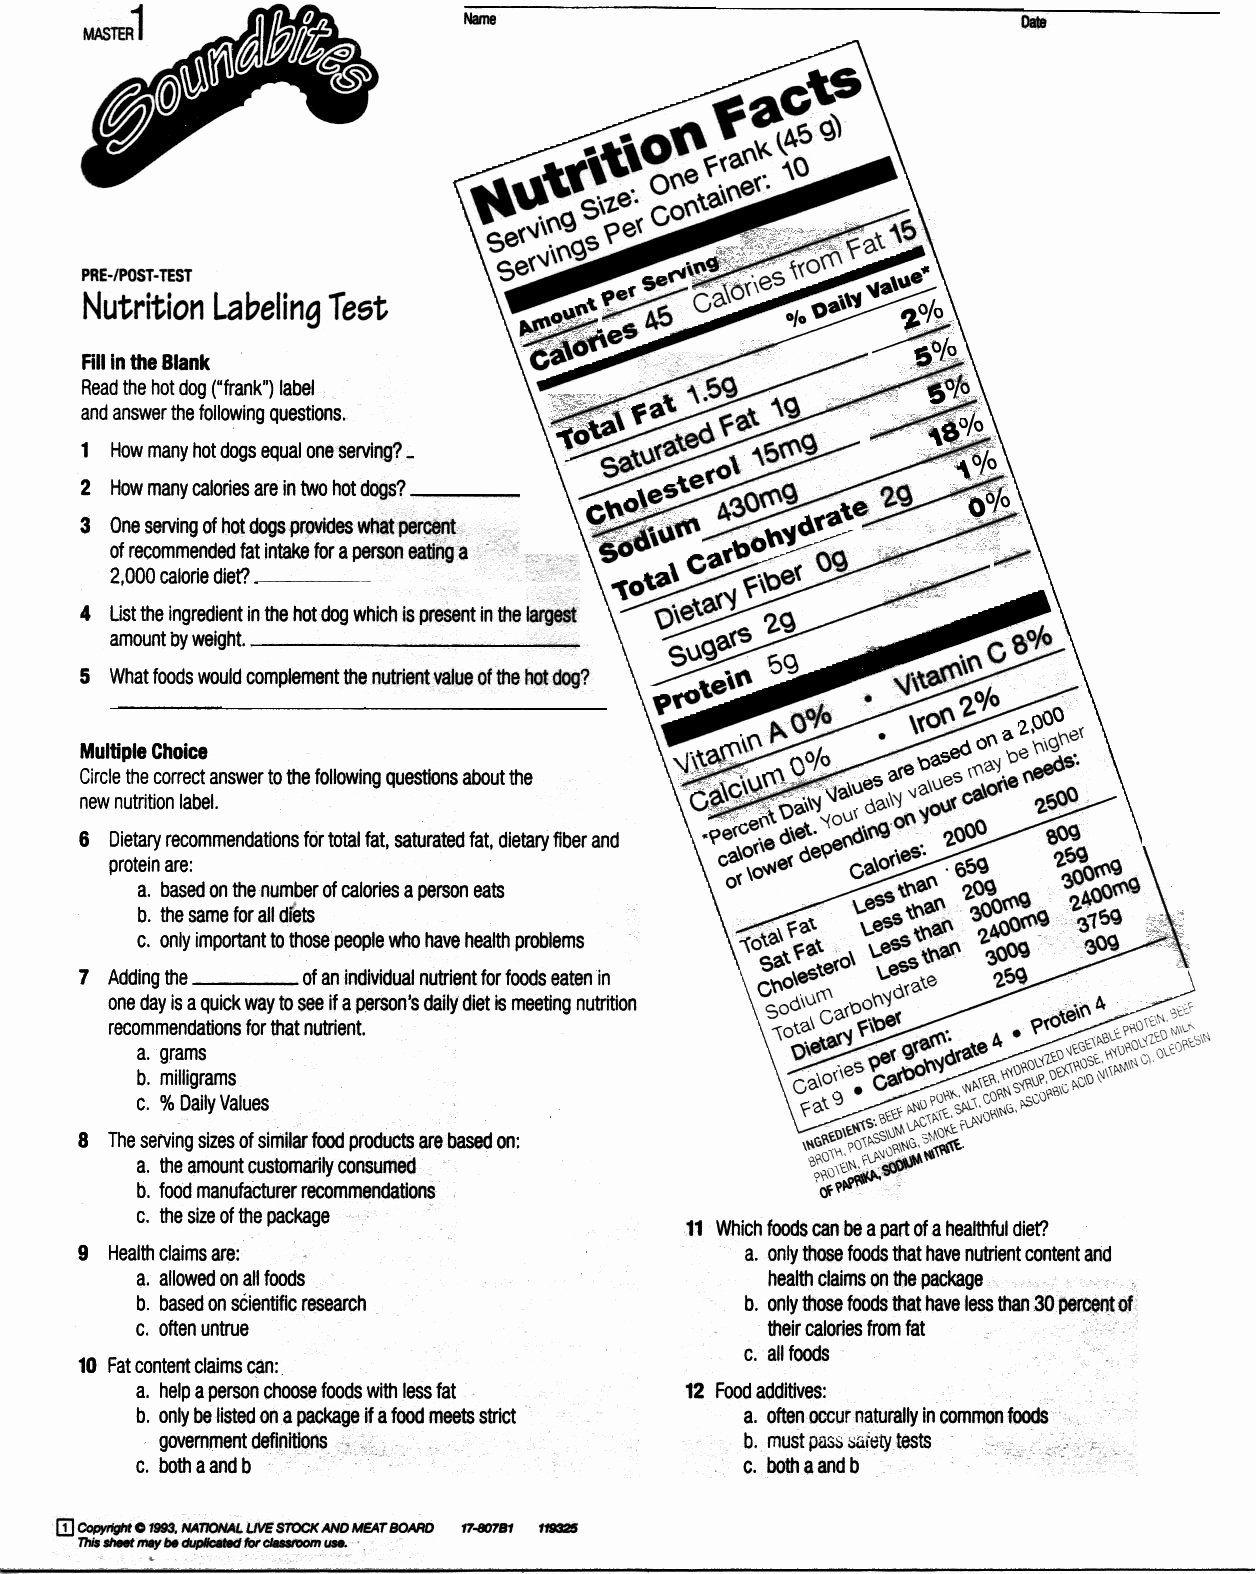 Nutrition Label Worksheet Answers Elegant Reading